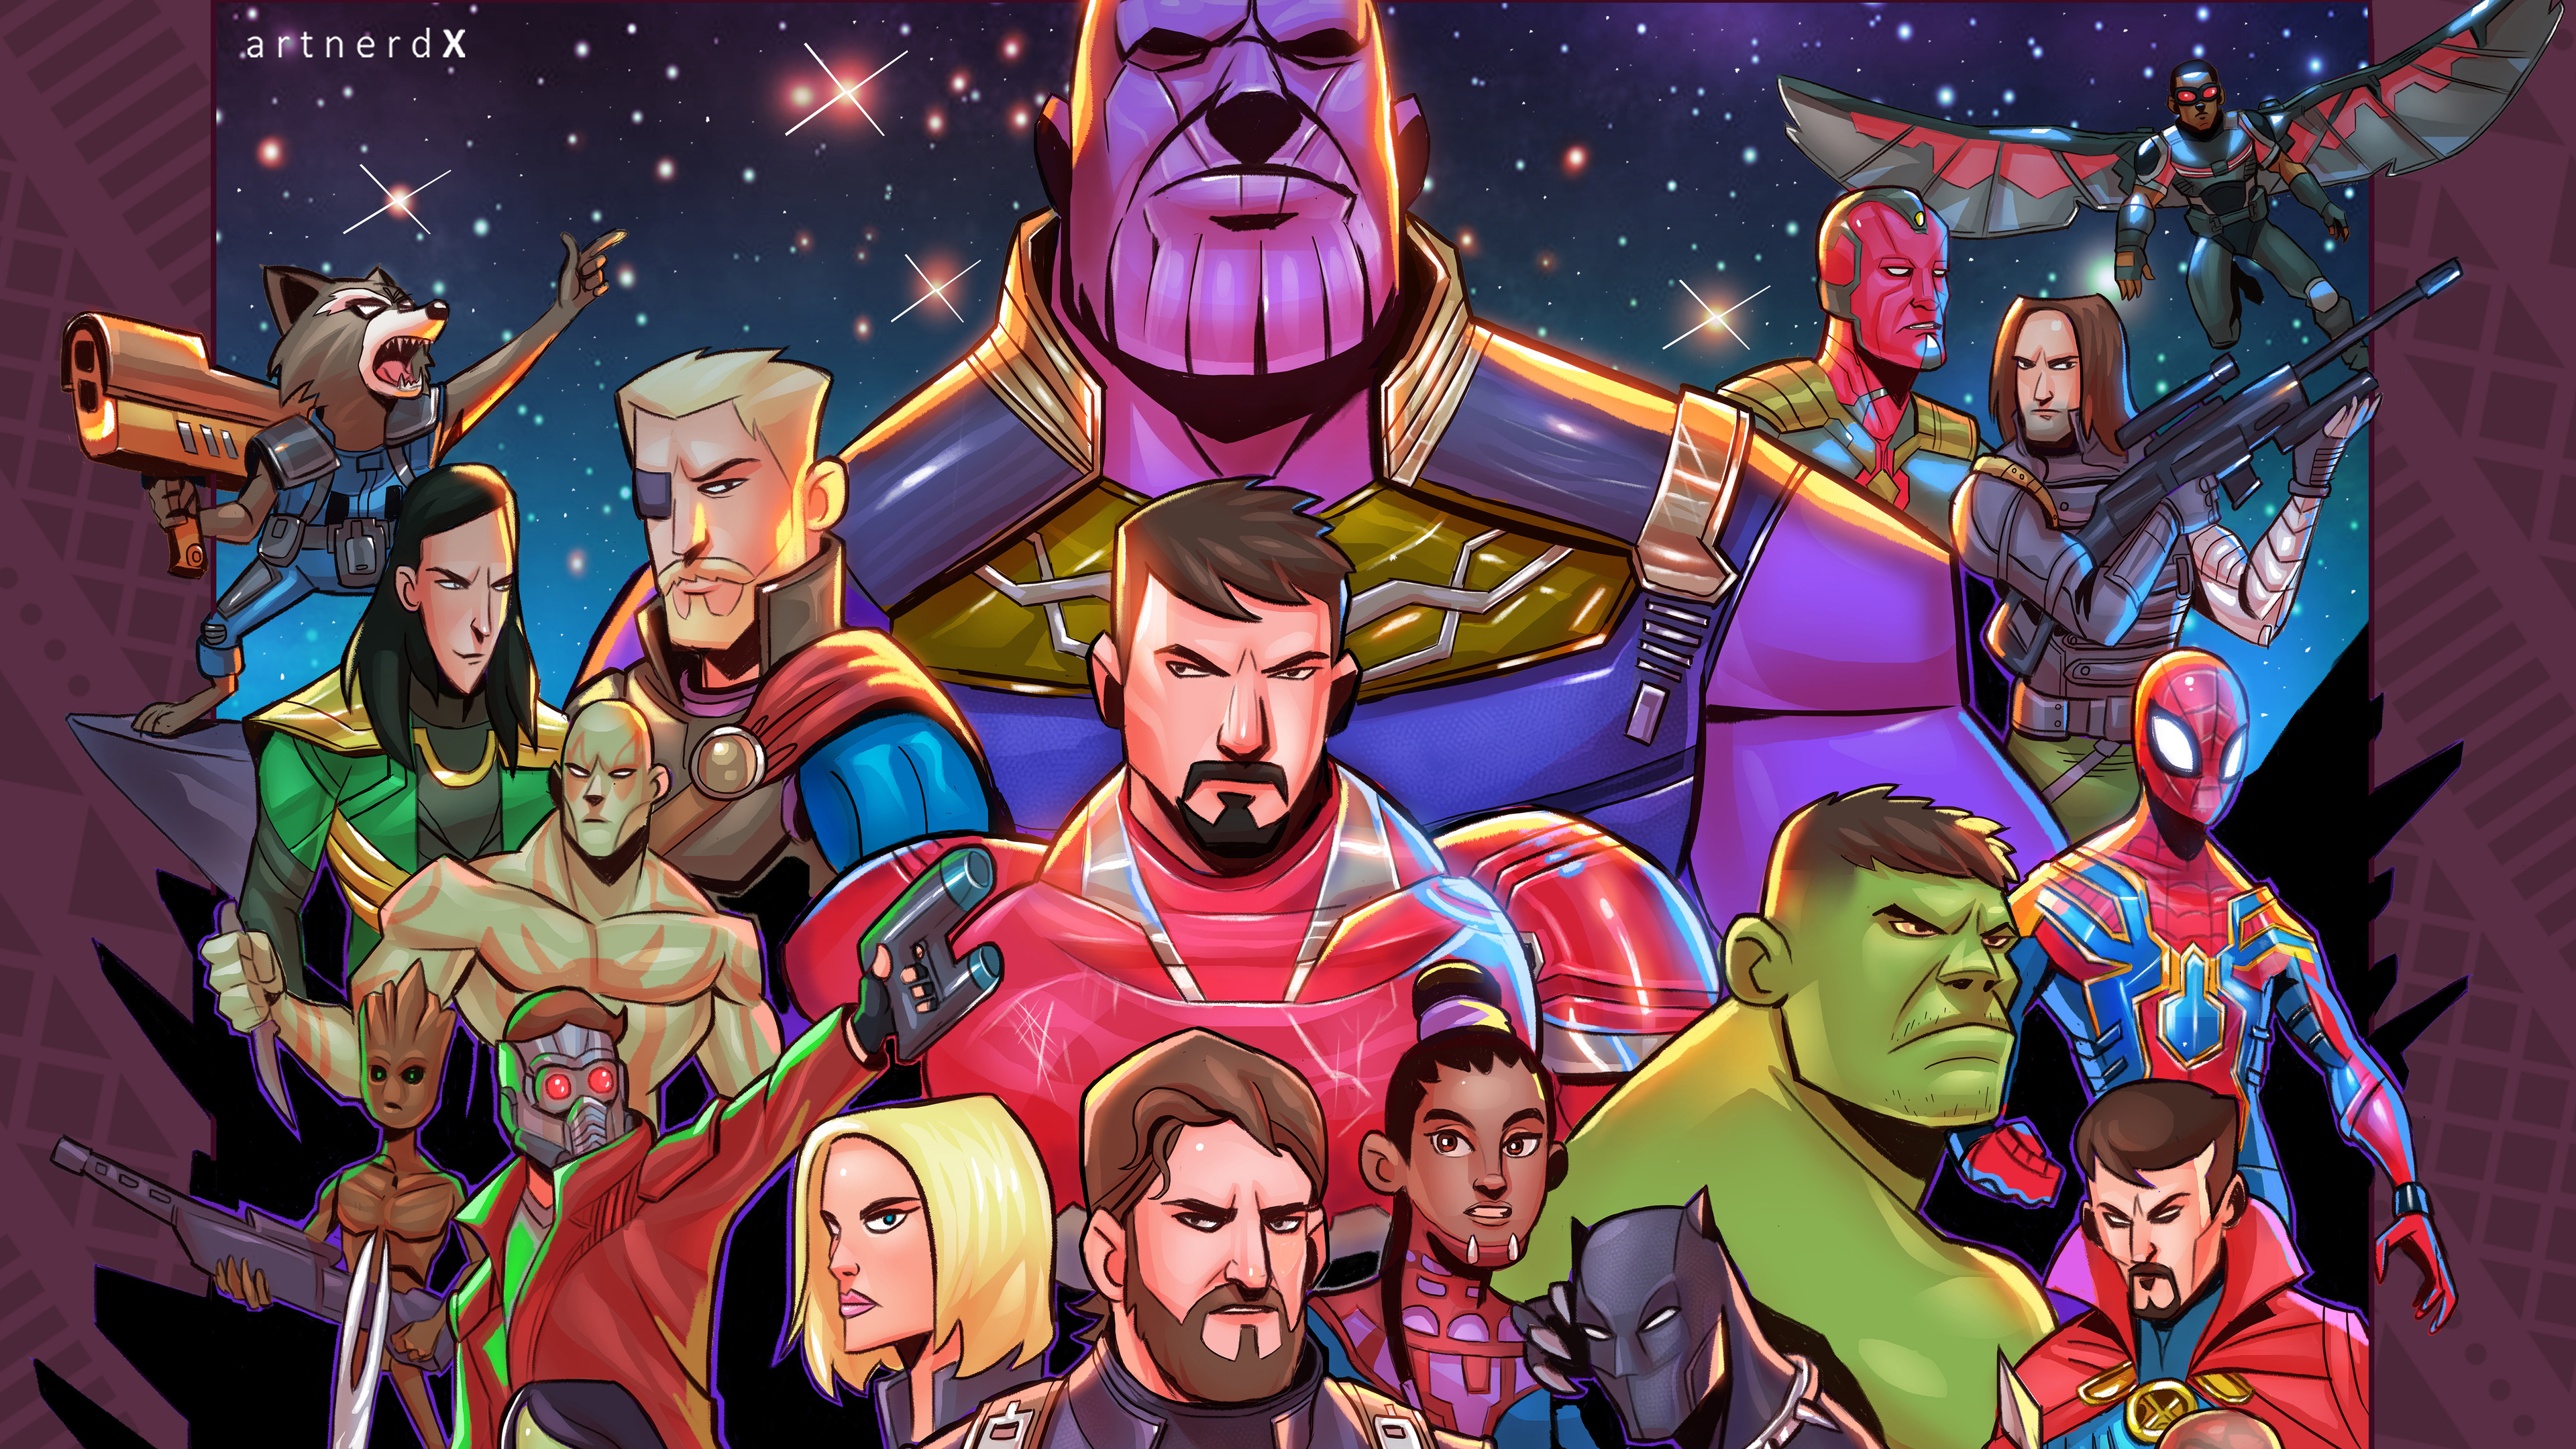 Wallpaper 4k Avengers Infinity War Superheroes Artwork 2018